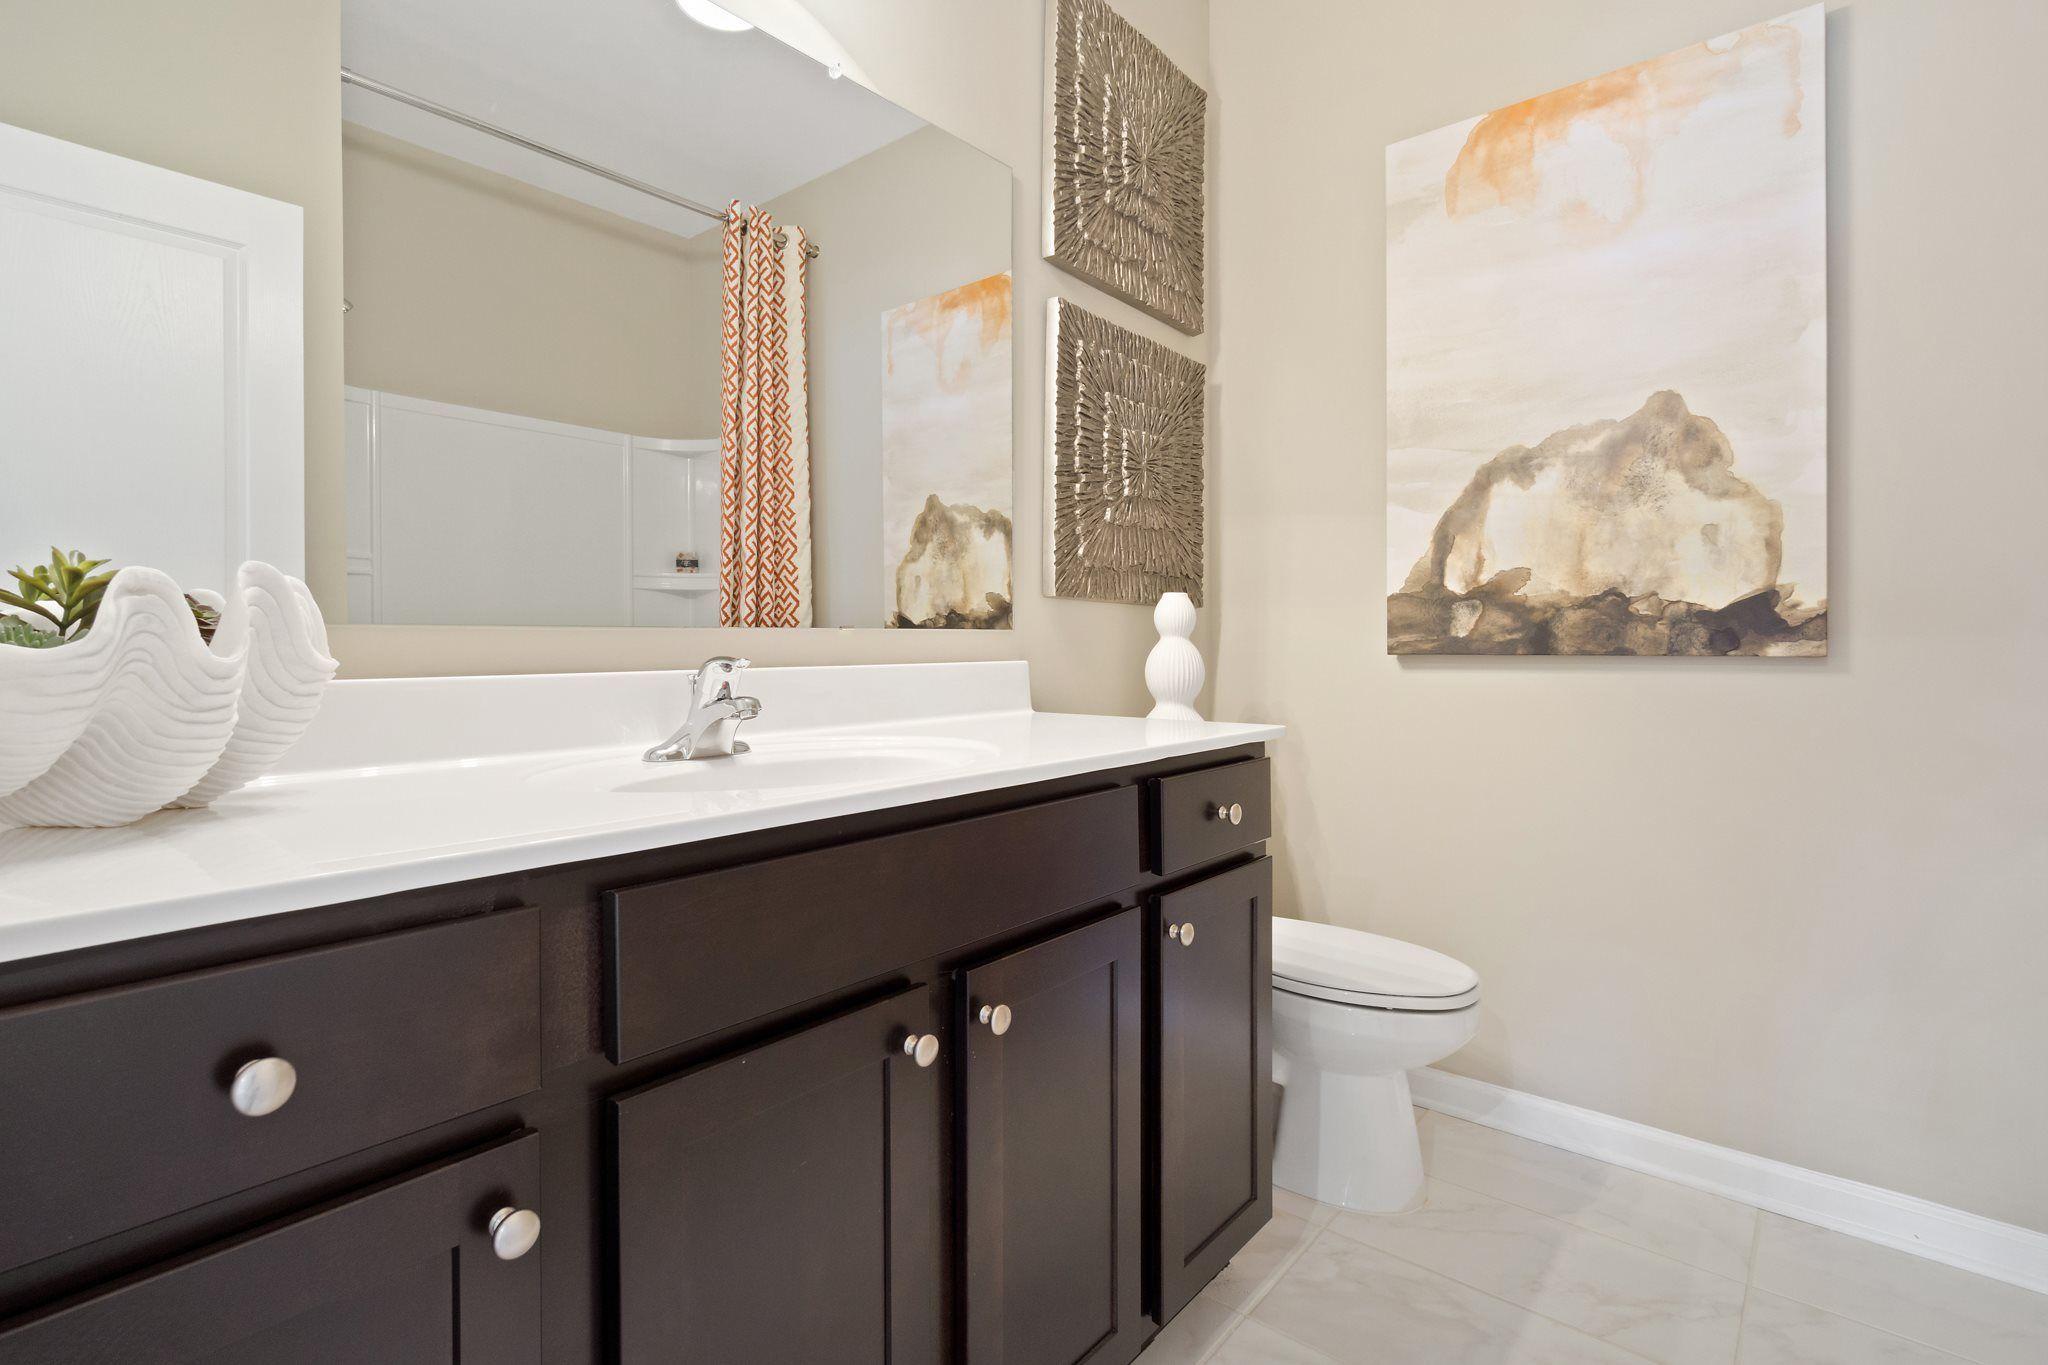 Bathroom featured in the ALDEN By Lennar in Atlanta, GA